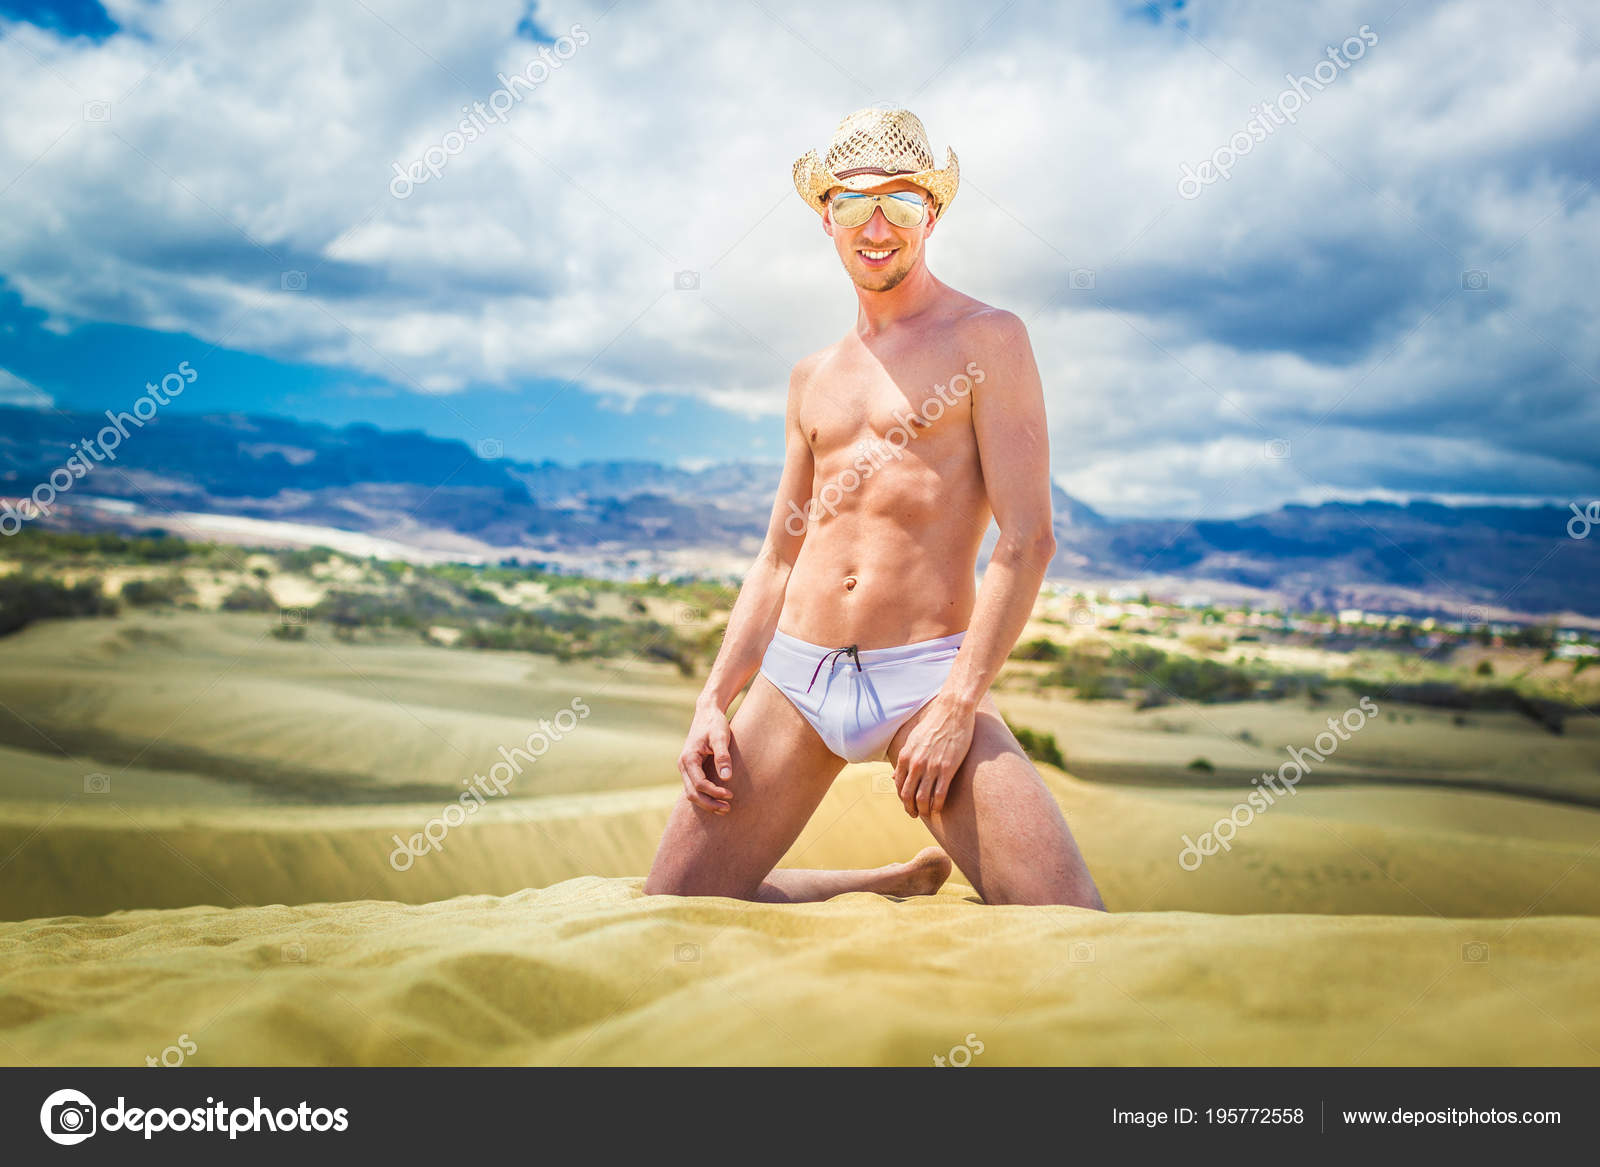 chaud droit gay sexe ébène butin tubes